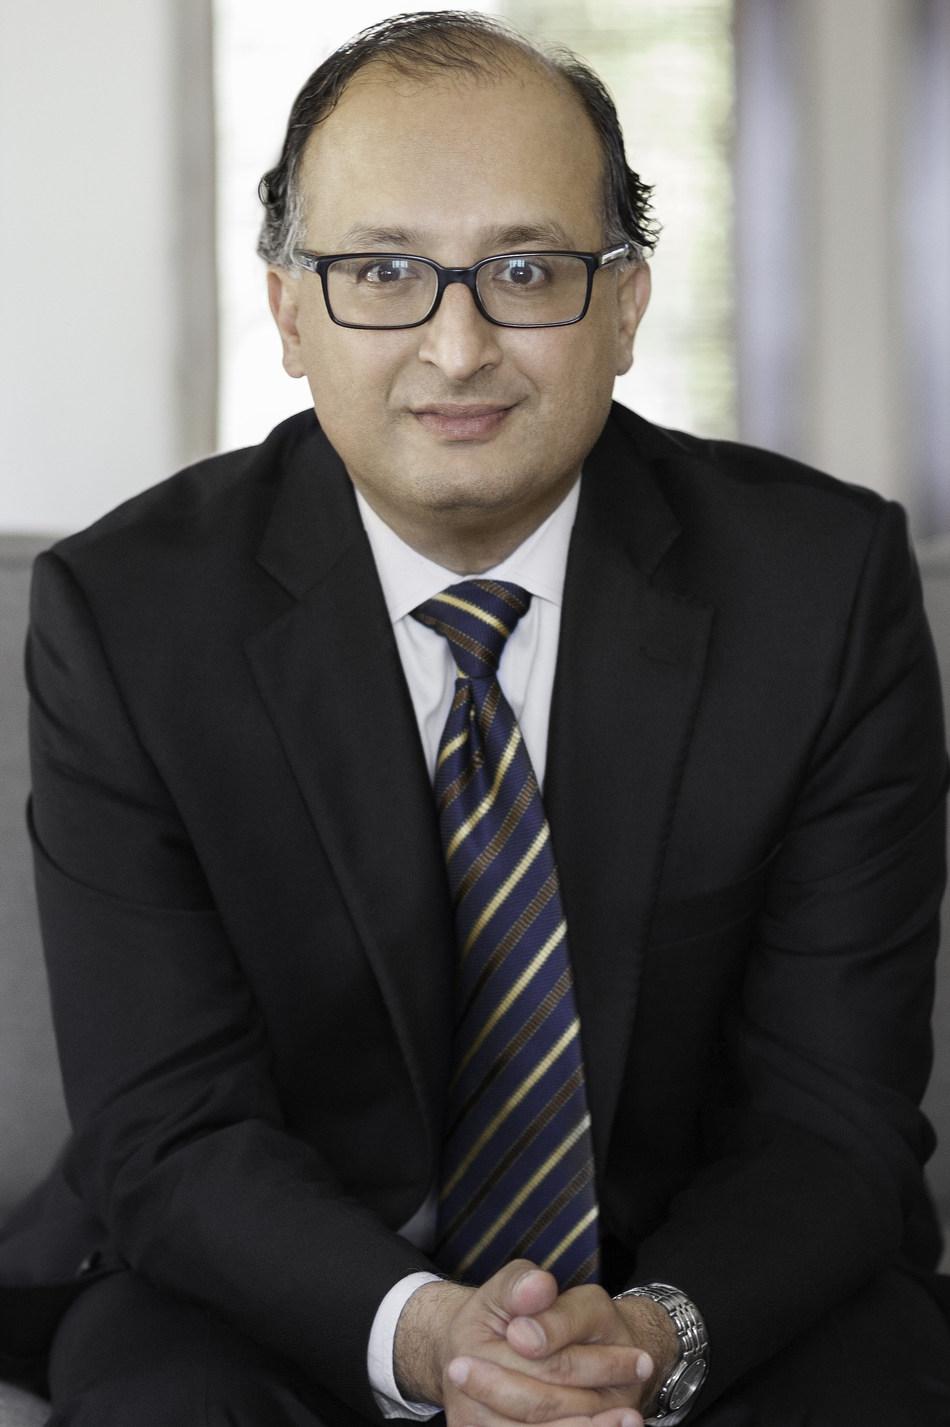 Professor Sujit Choudhry